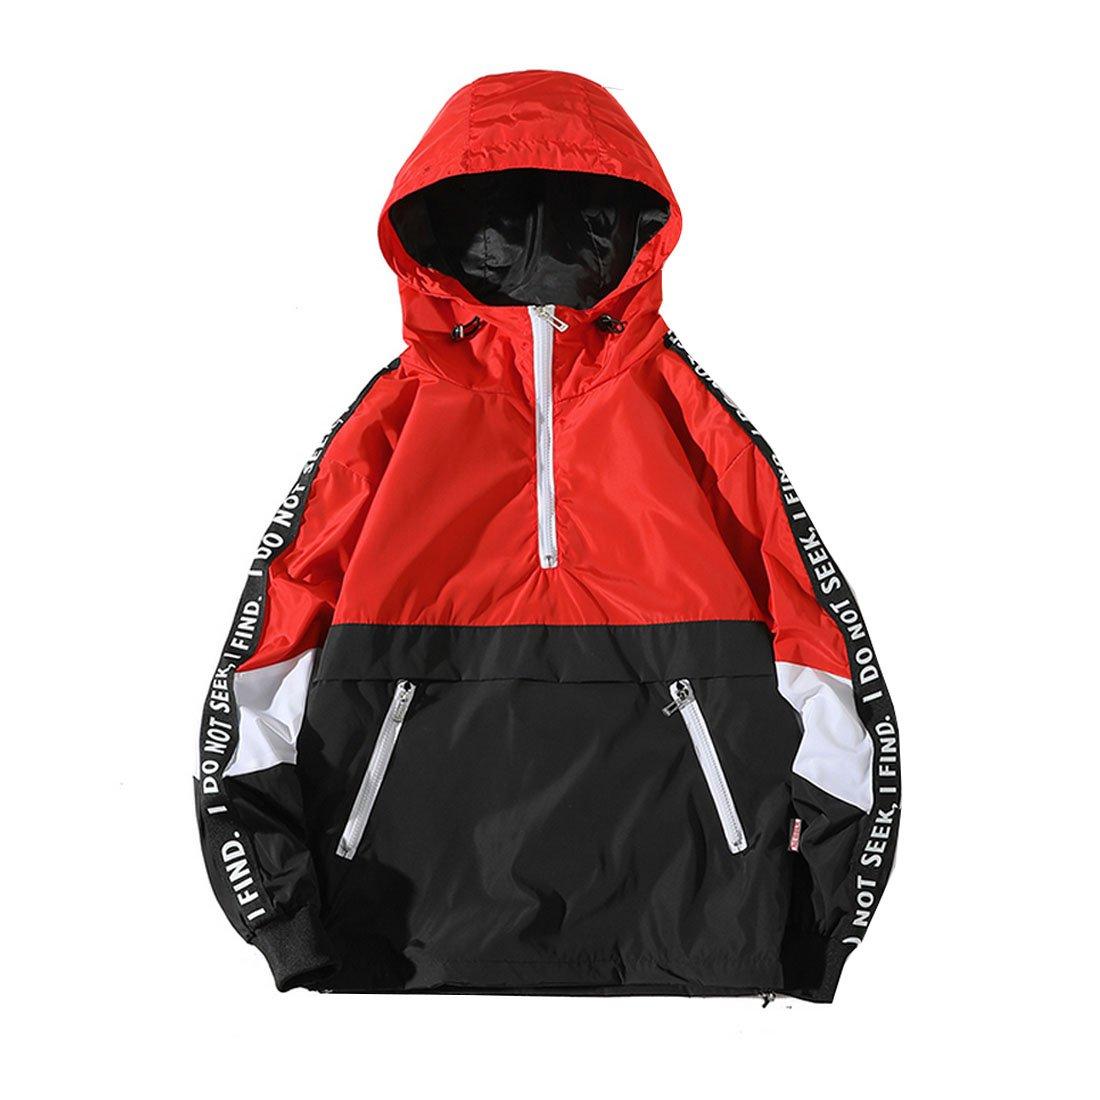 Hzcx Fashion Mens Pullover Hooded Waterproof Lightweight Windbreaker Jackets SJXZ709-JK06-60-RE-US XL TAG 4XL